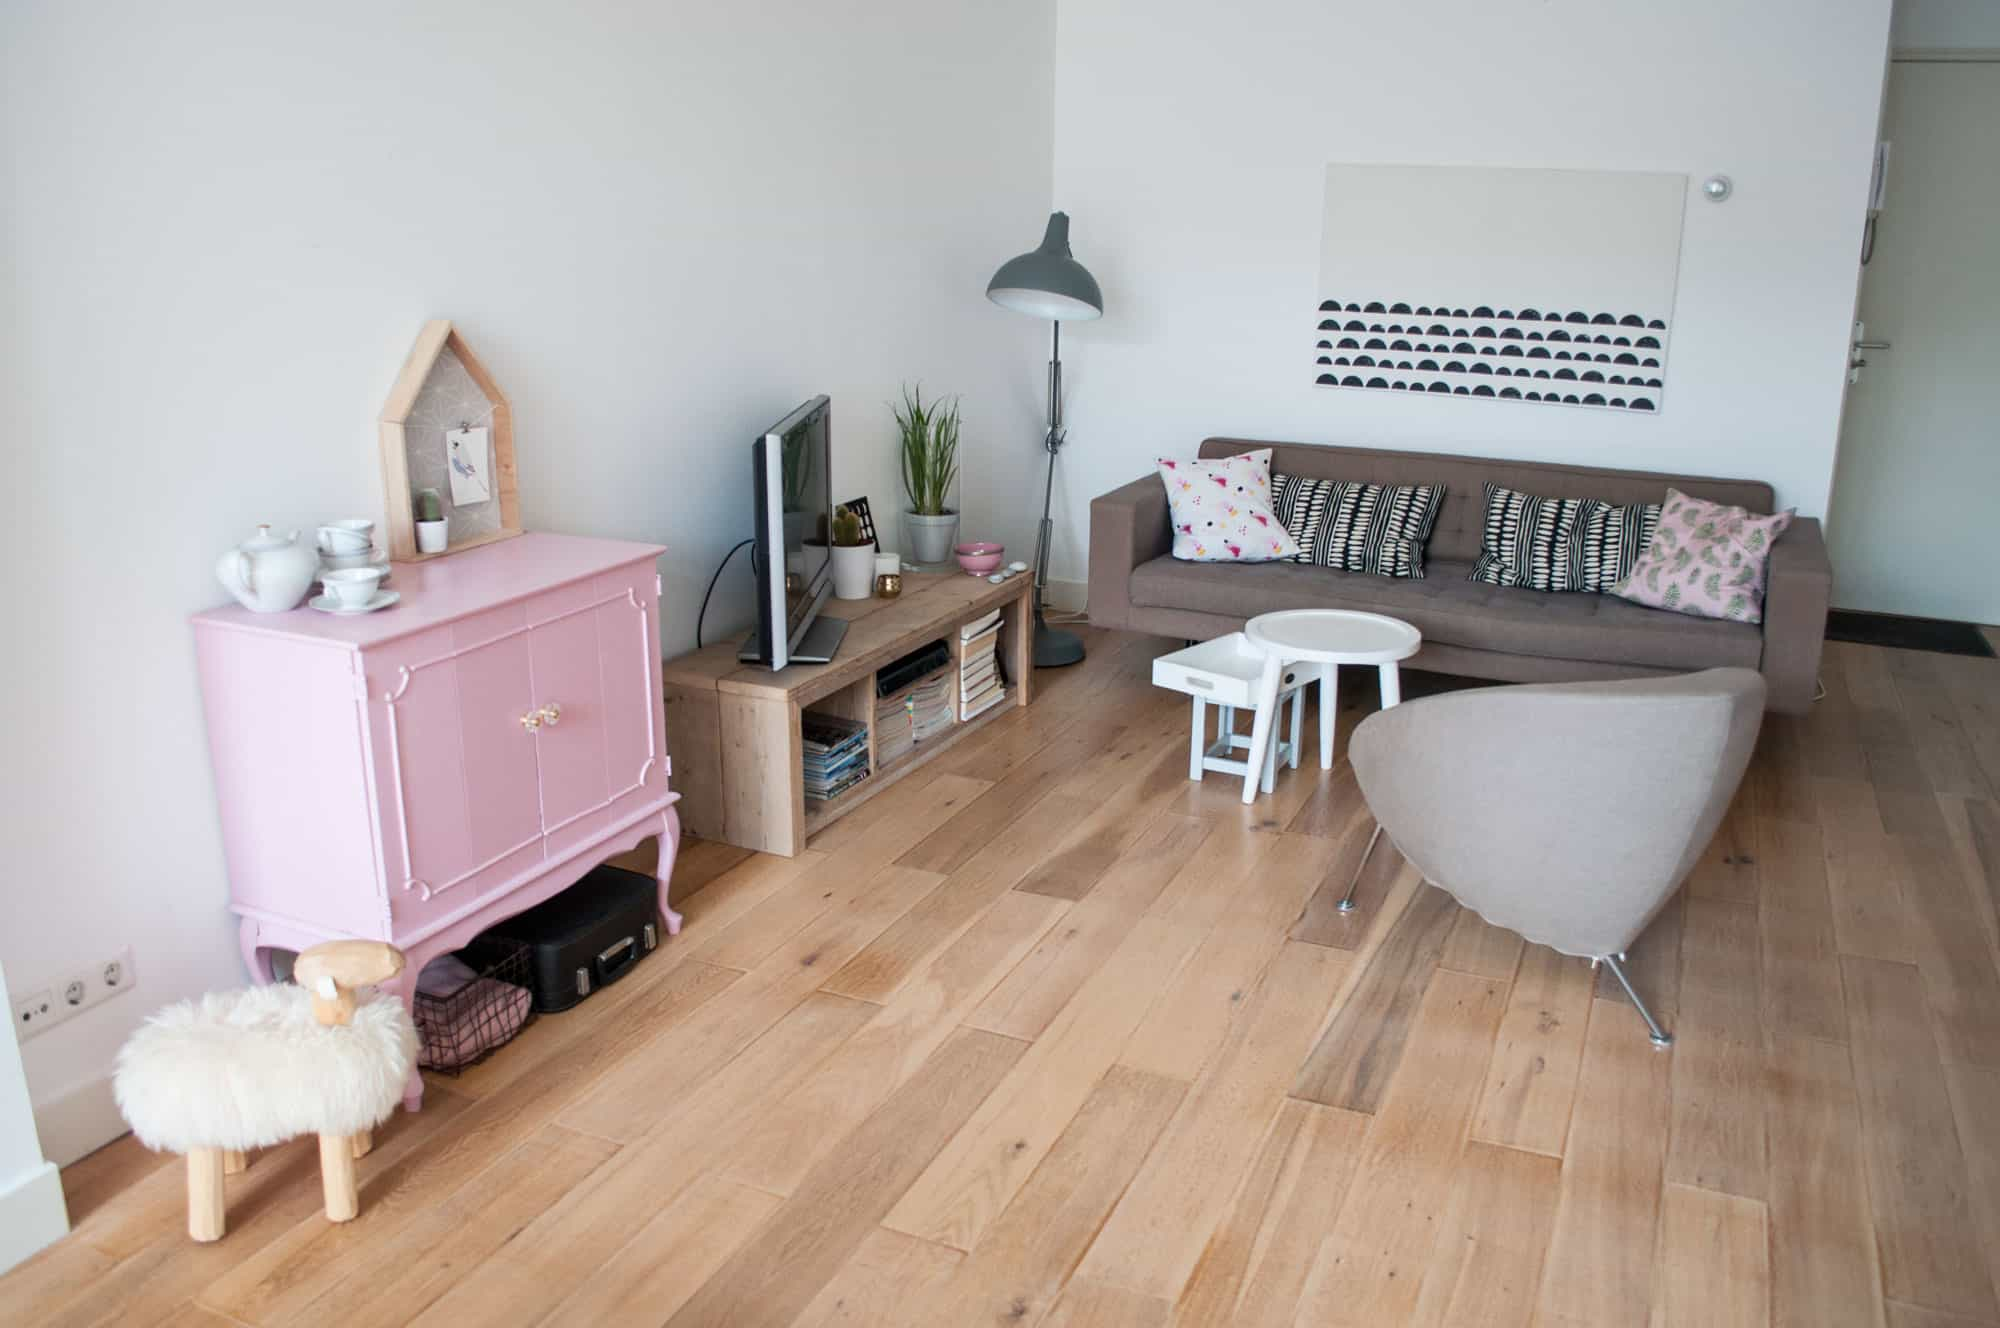 DIY Home Make Over | IMAKIN DIY DESIGN